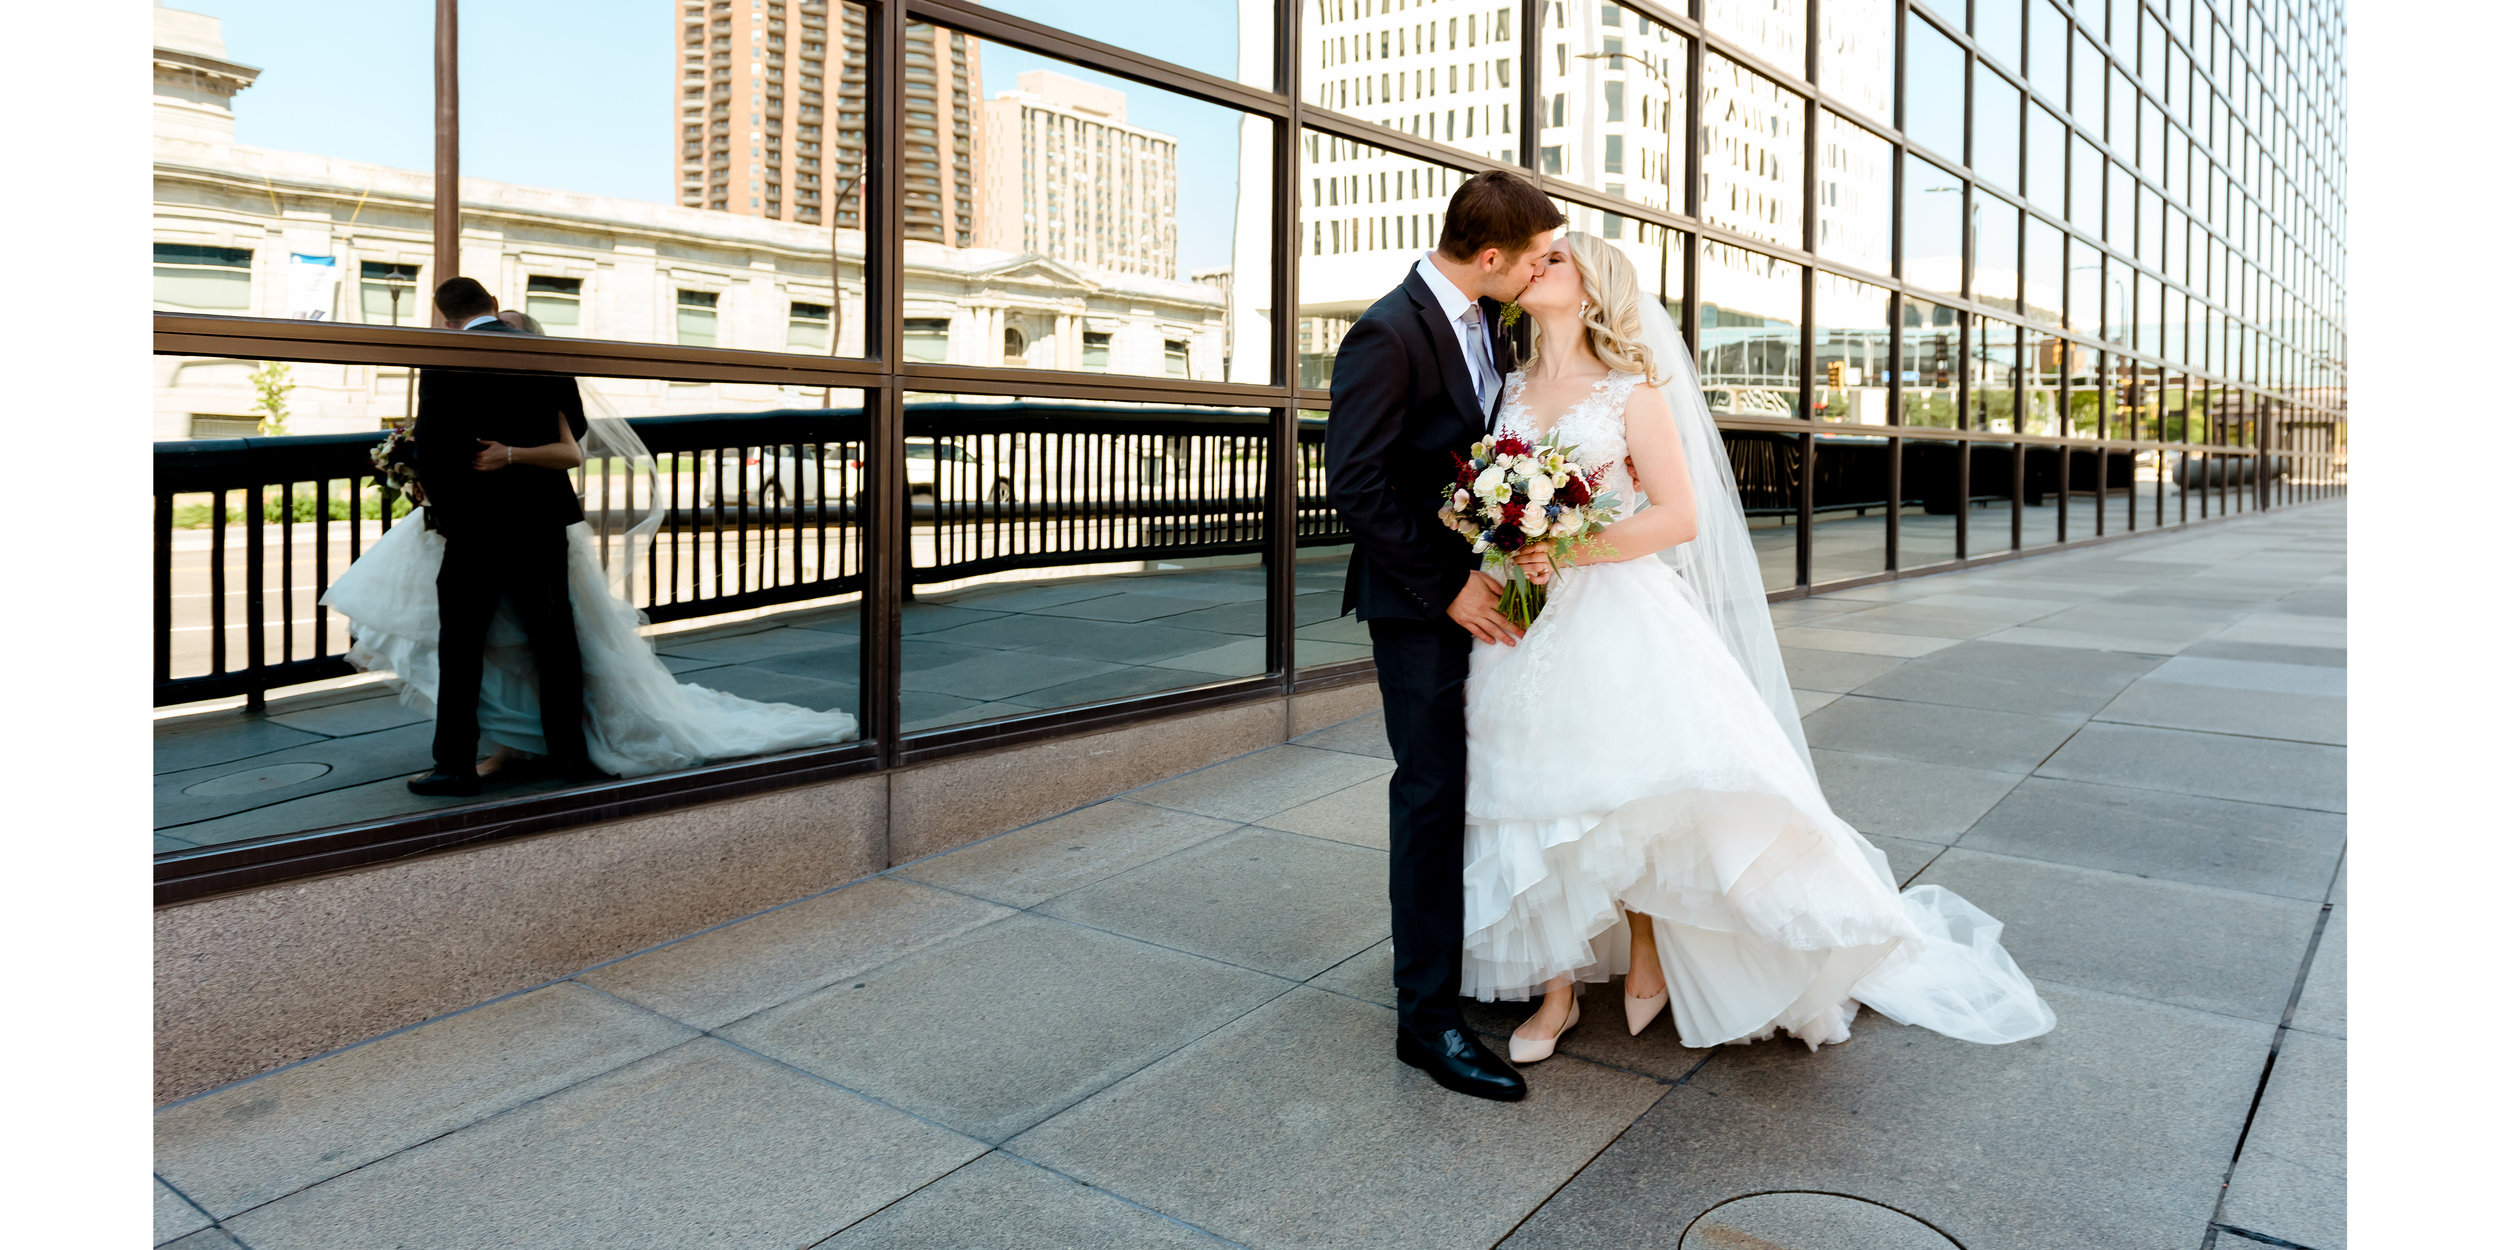 Kristen + Eric - Wedding Album Sample_11.jpg